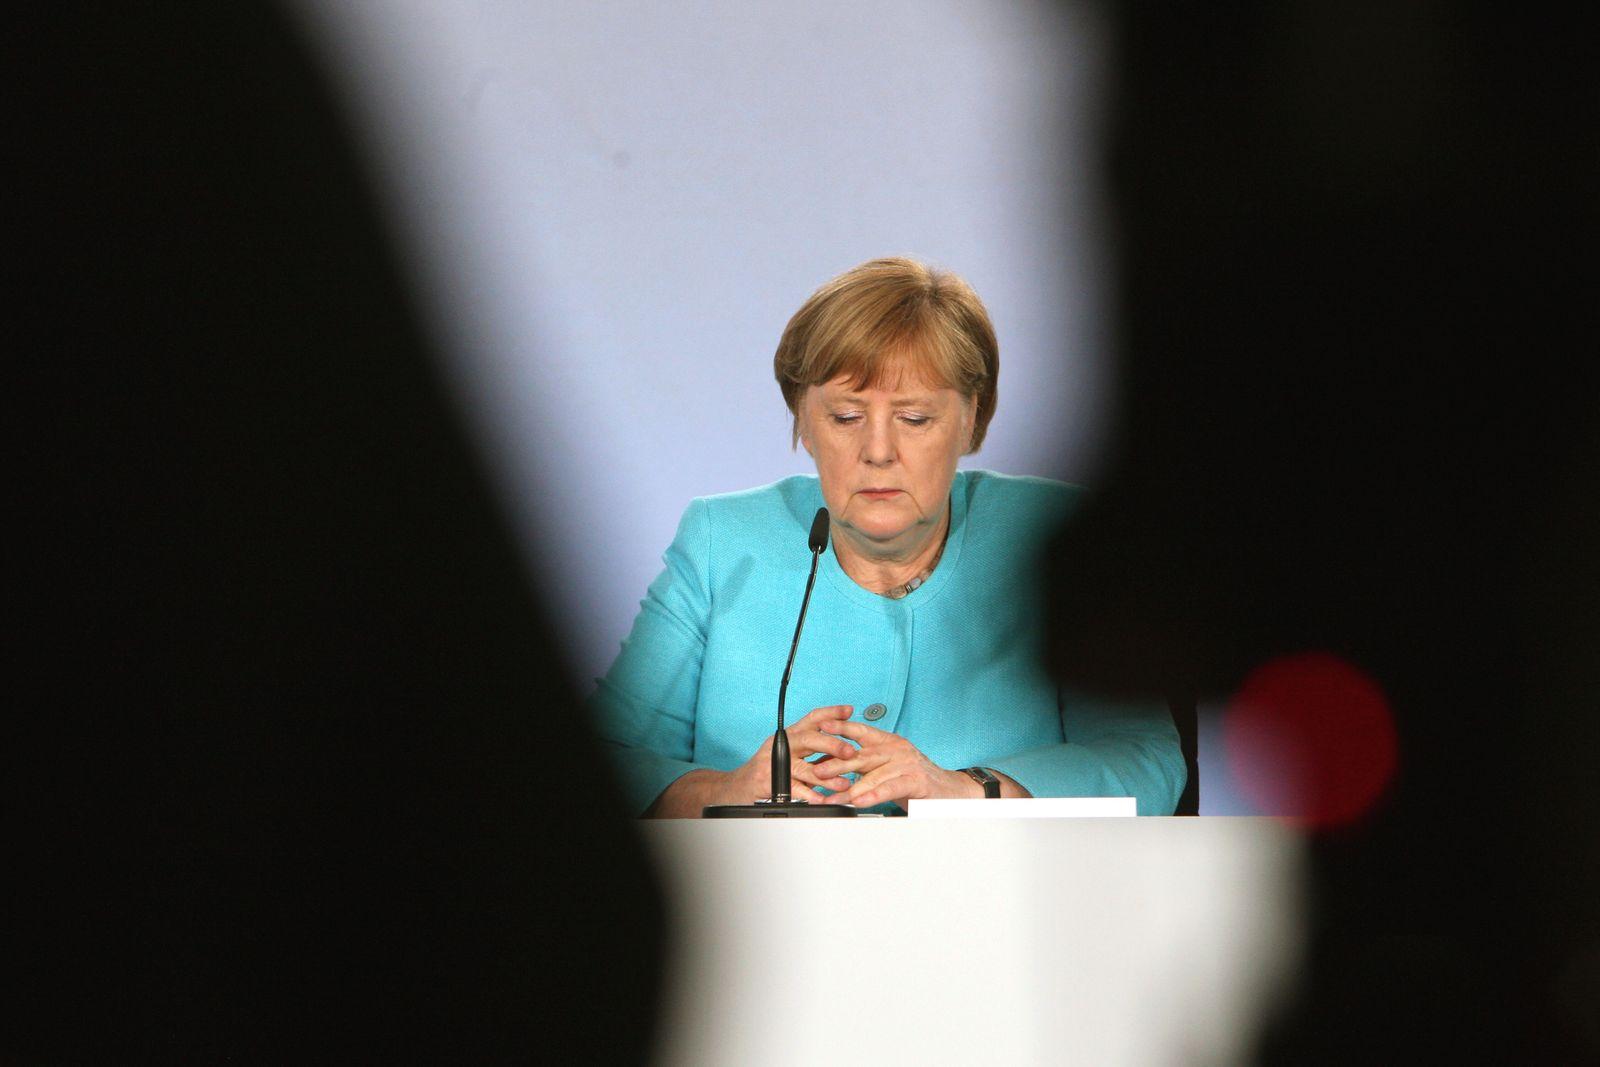 Coalition present their stimulus package during Coronavirus crisis in Berlin, Germany - 03 Jun 2020